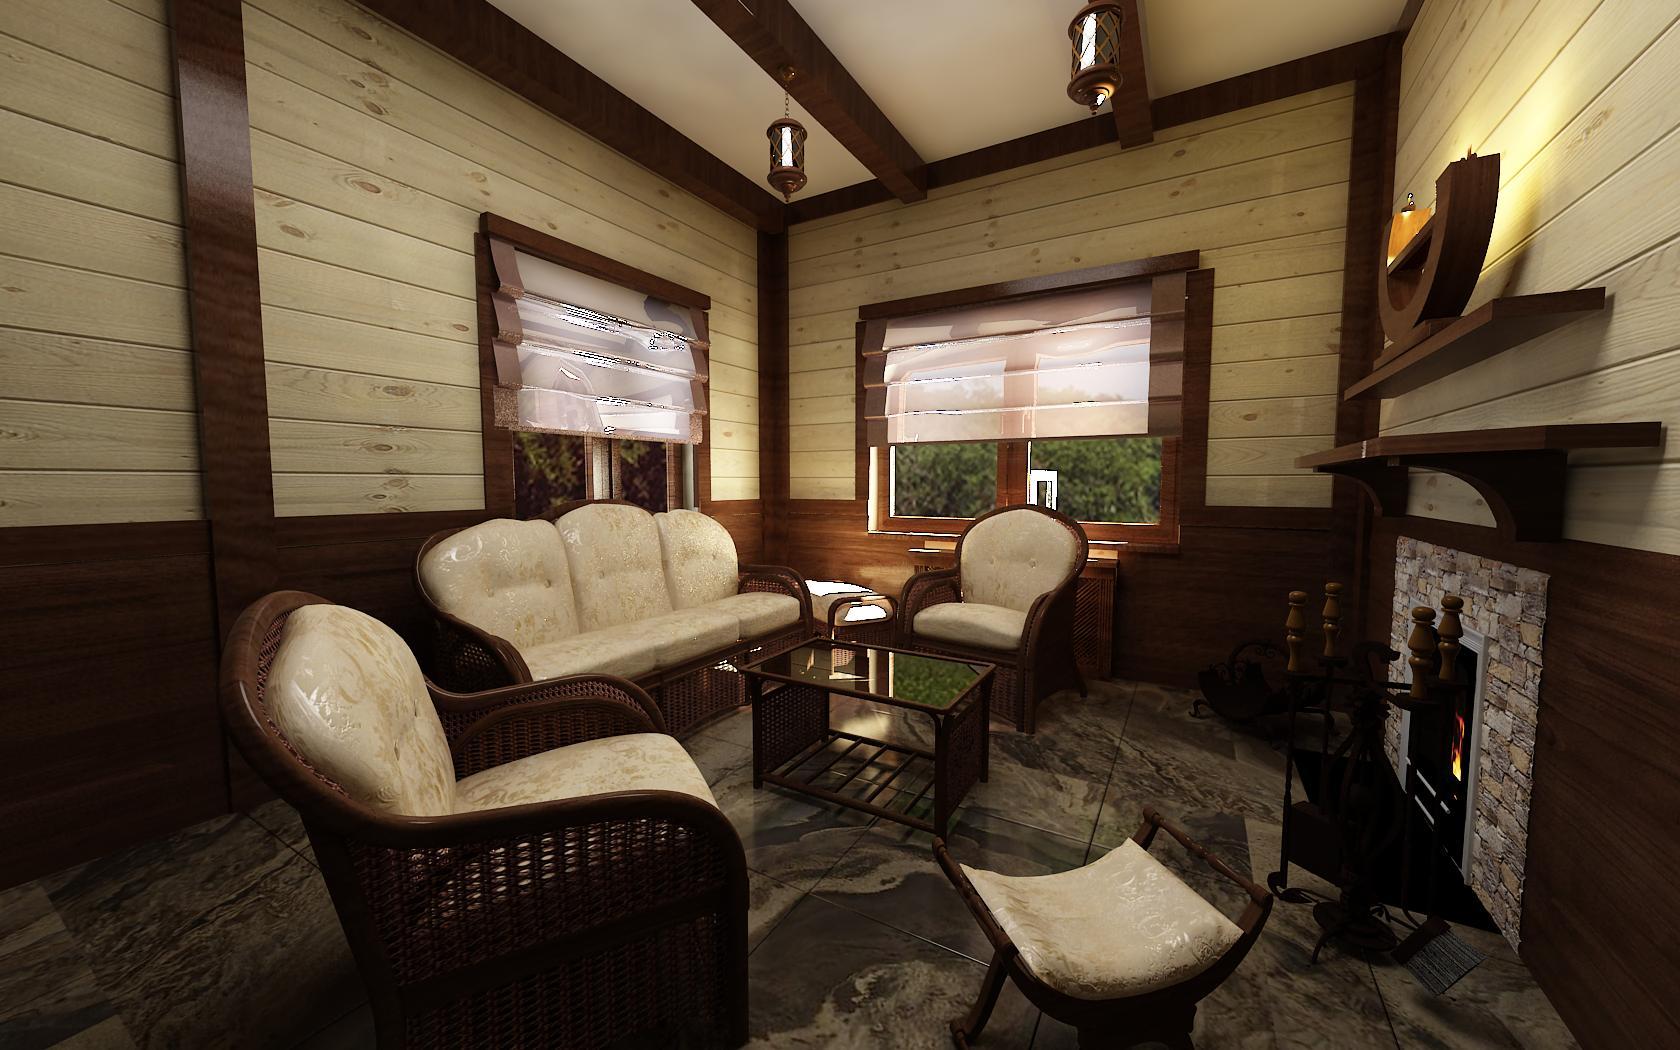 Отделка комнаты отдыха в бане своими руками